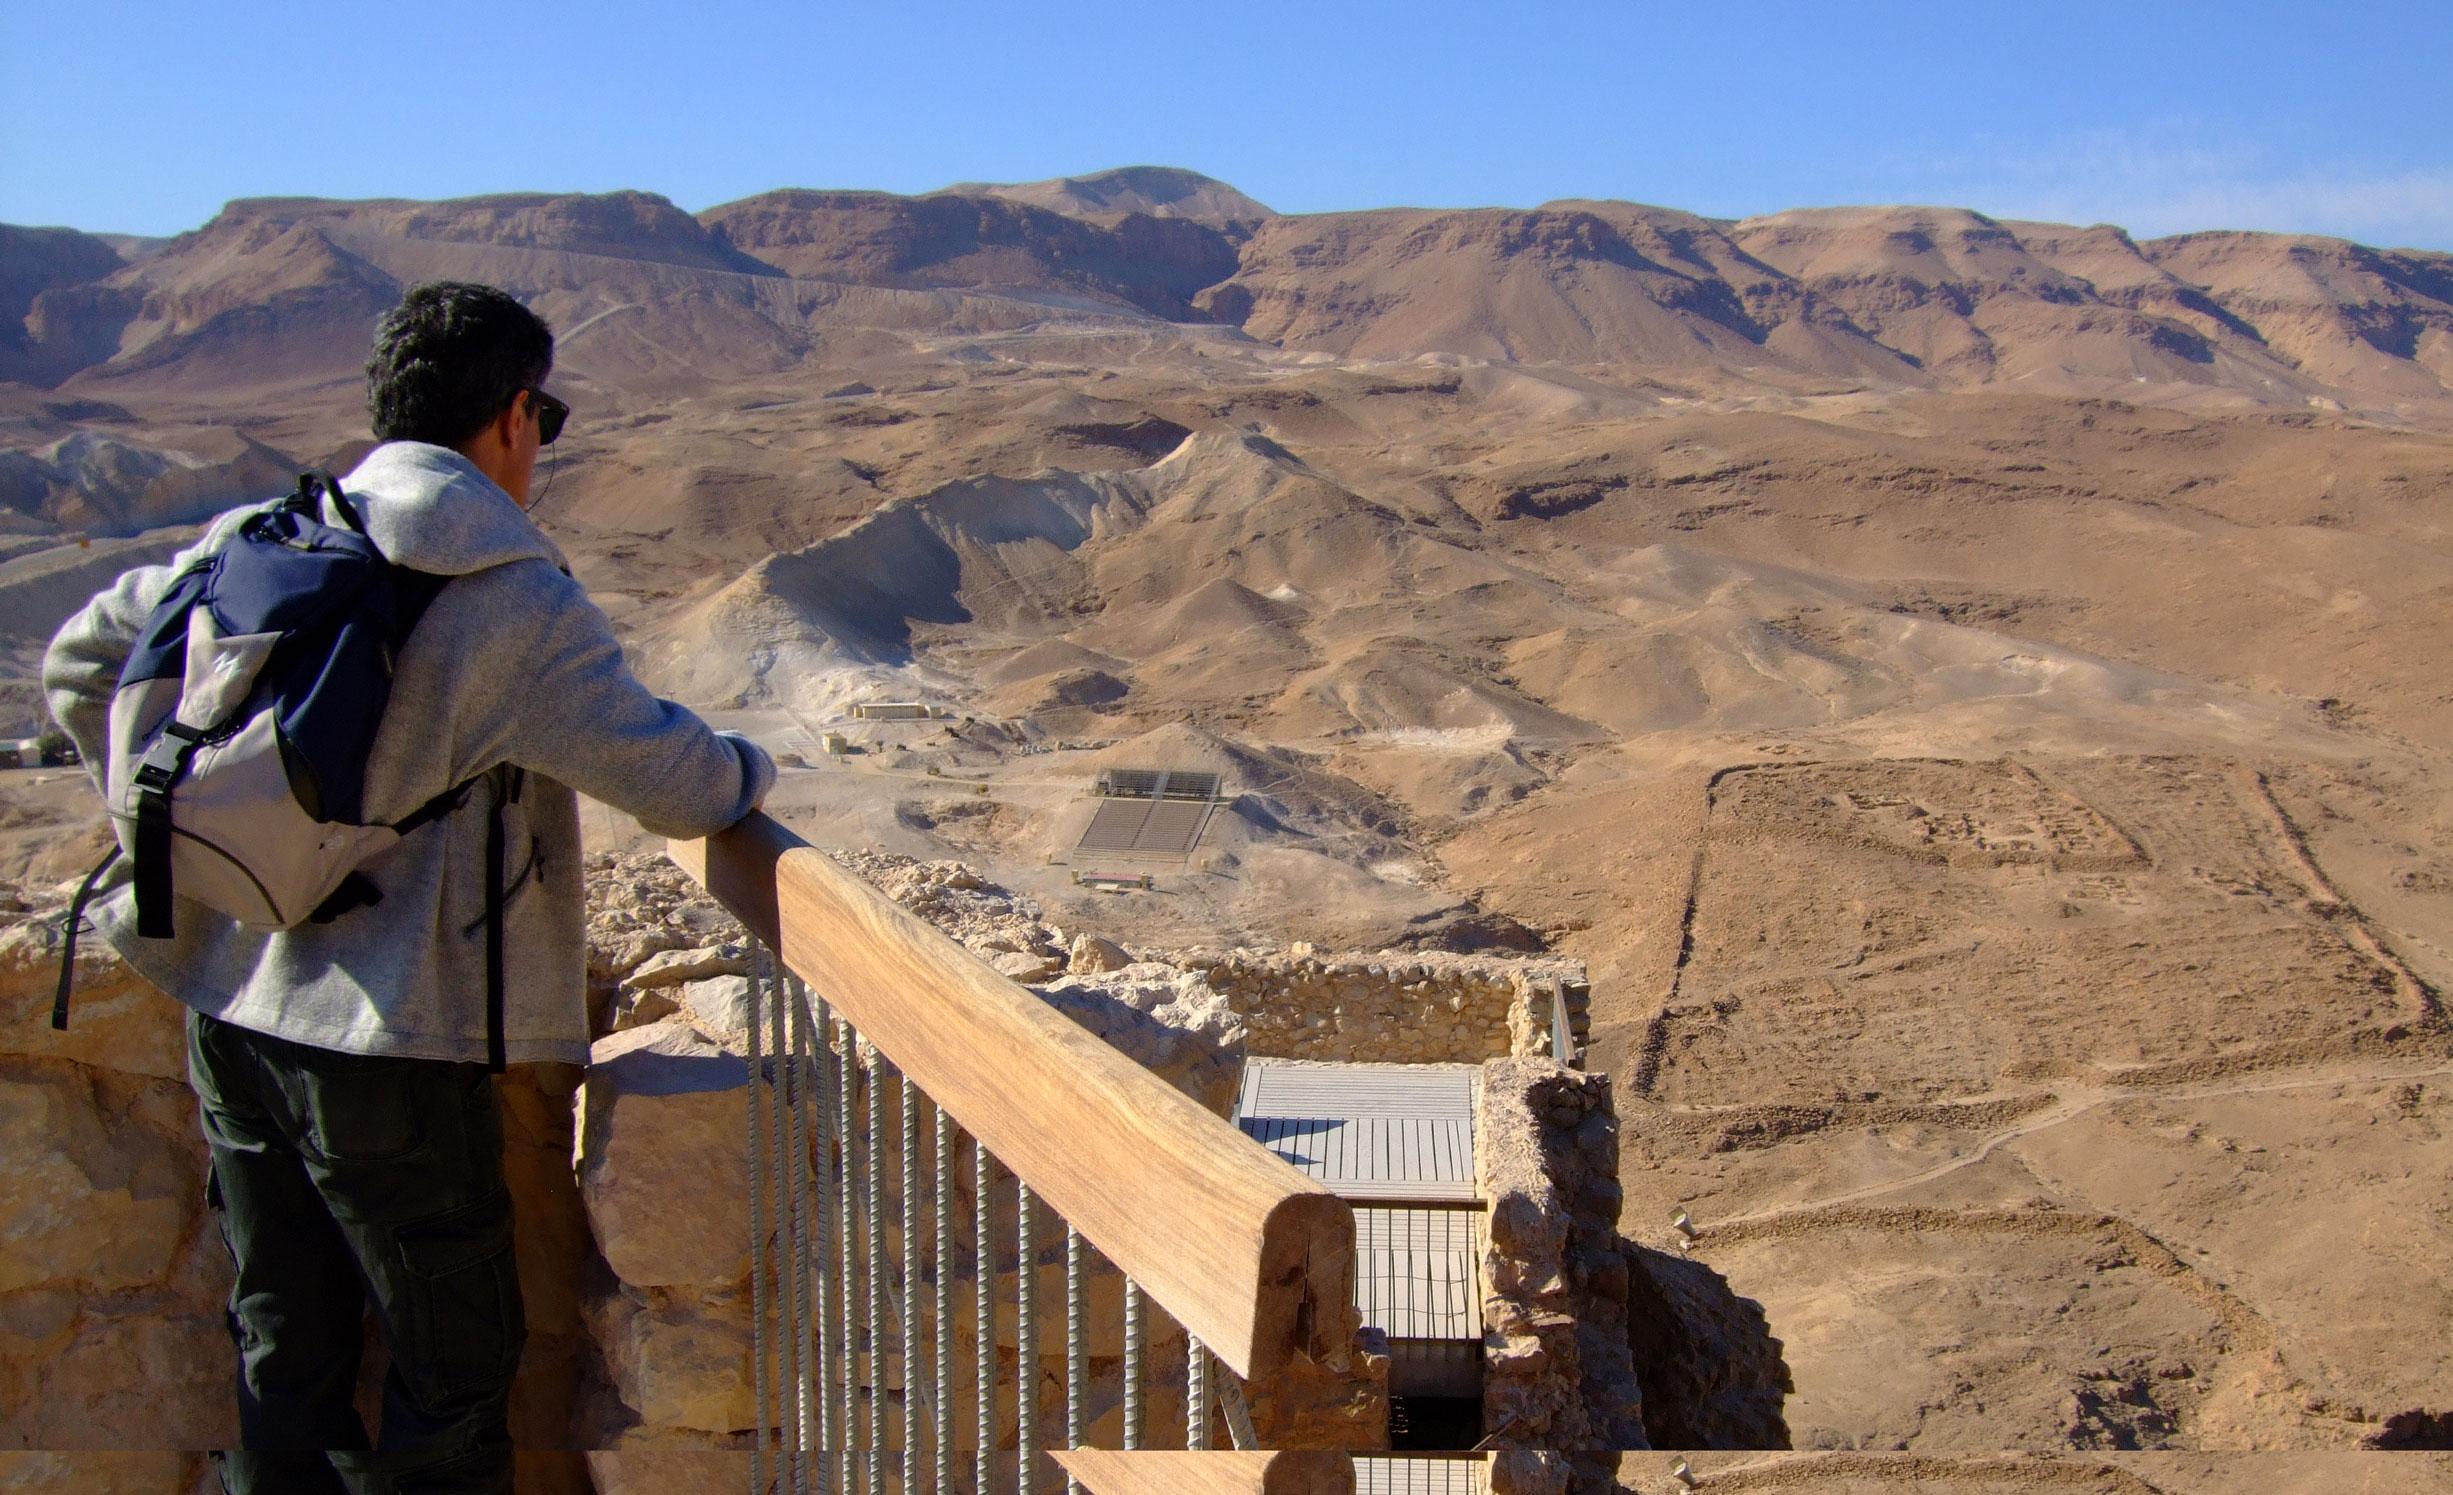 Luca Errera, Daniela Trastulli, Israele, Masada, accampamento romano